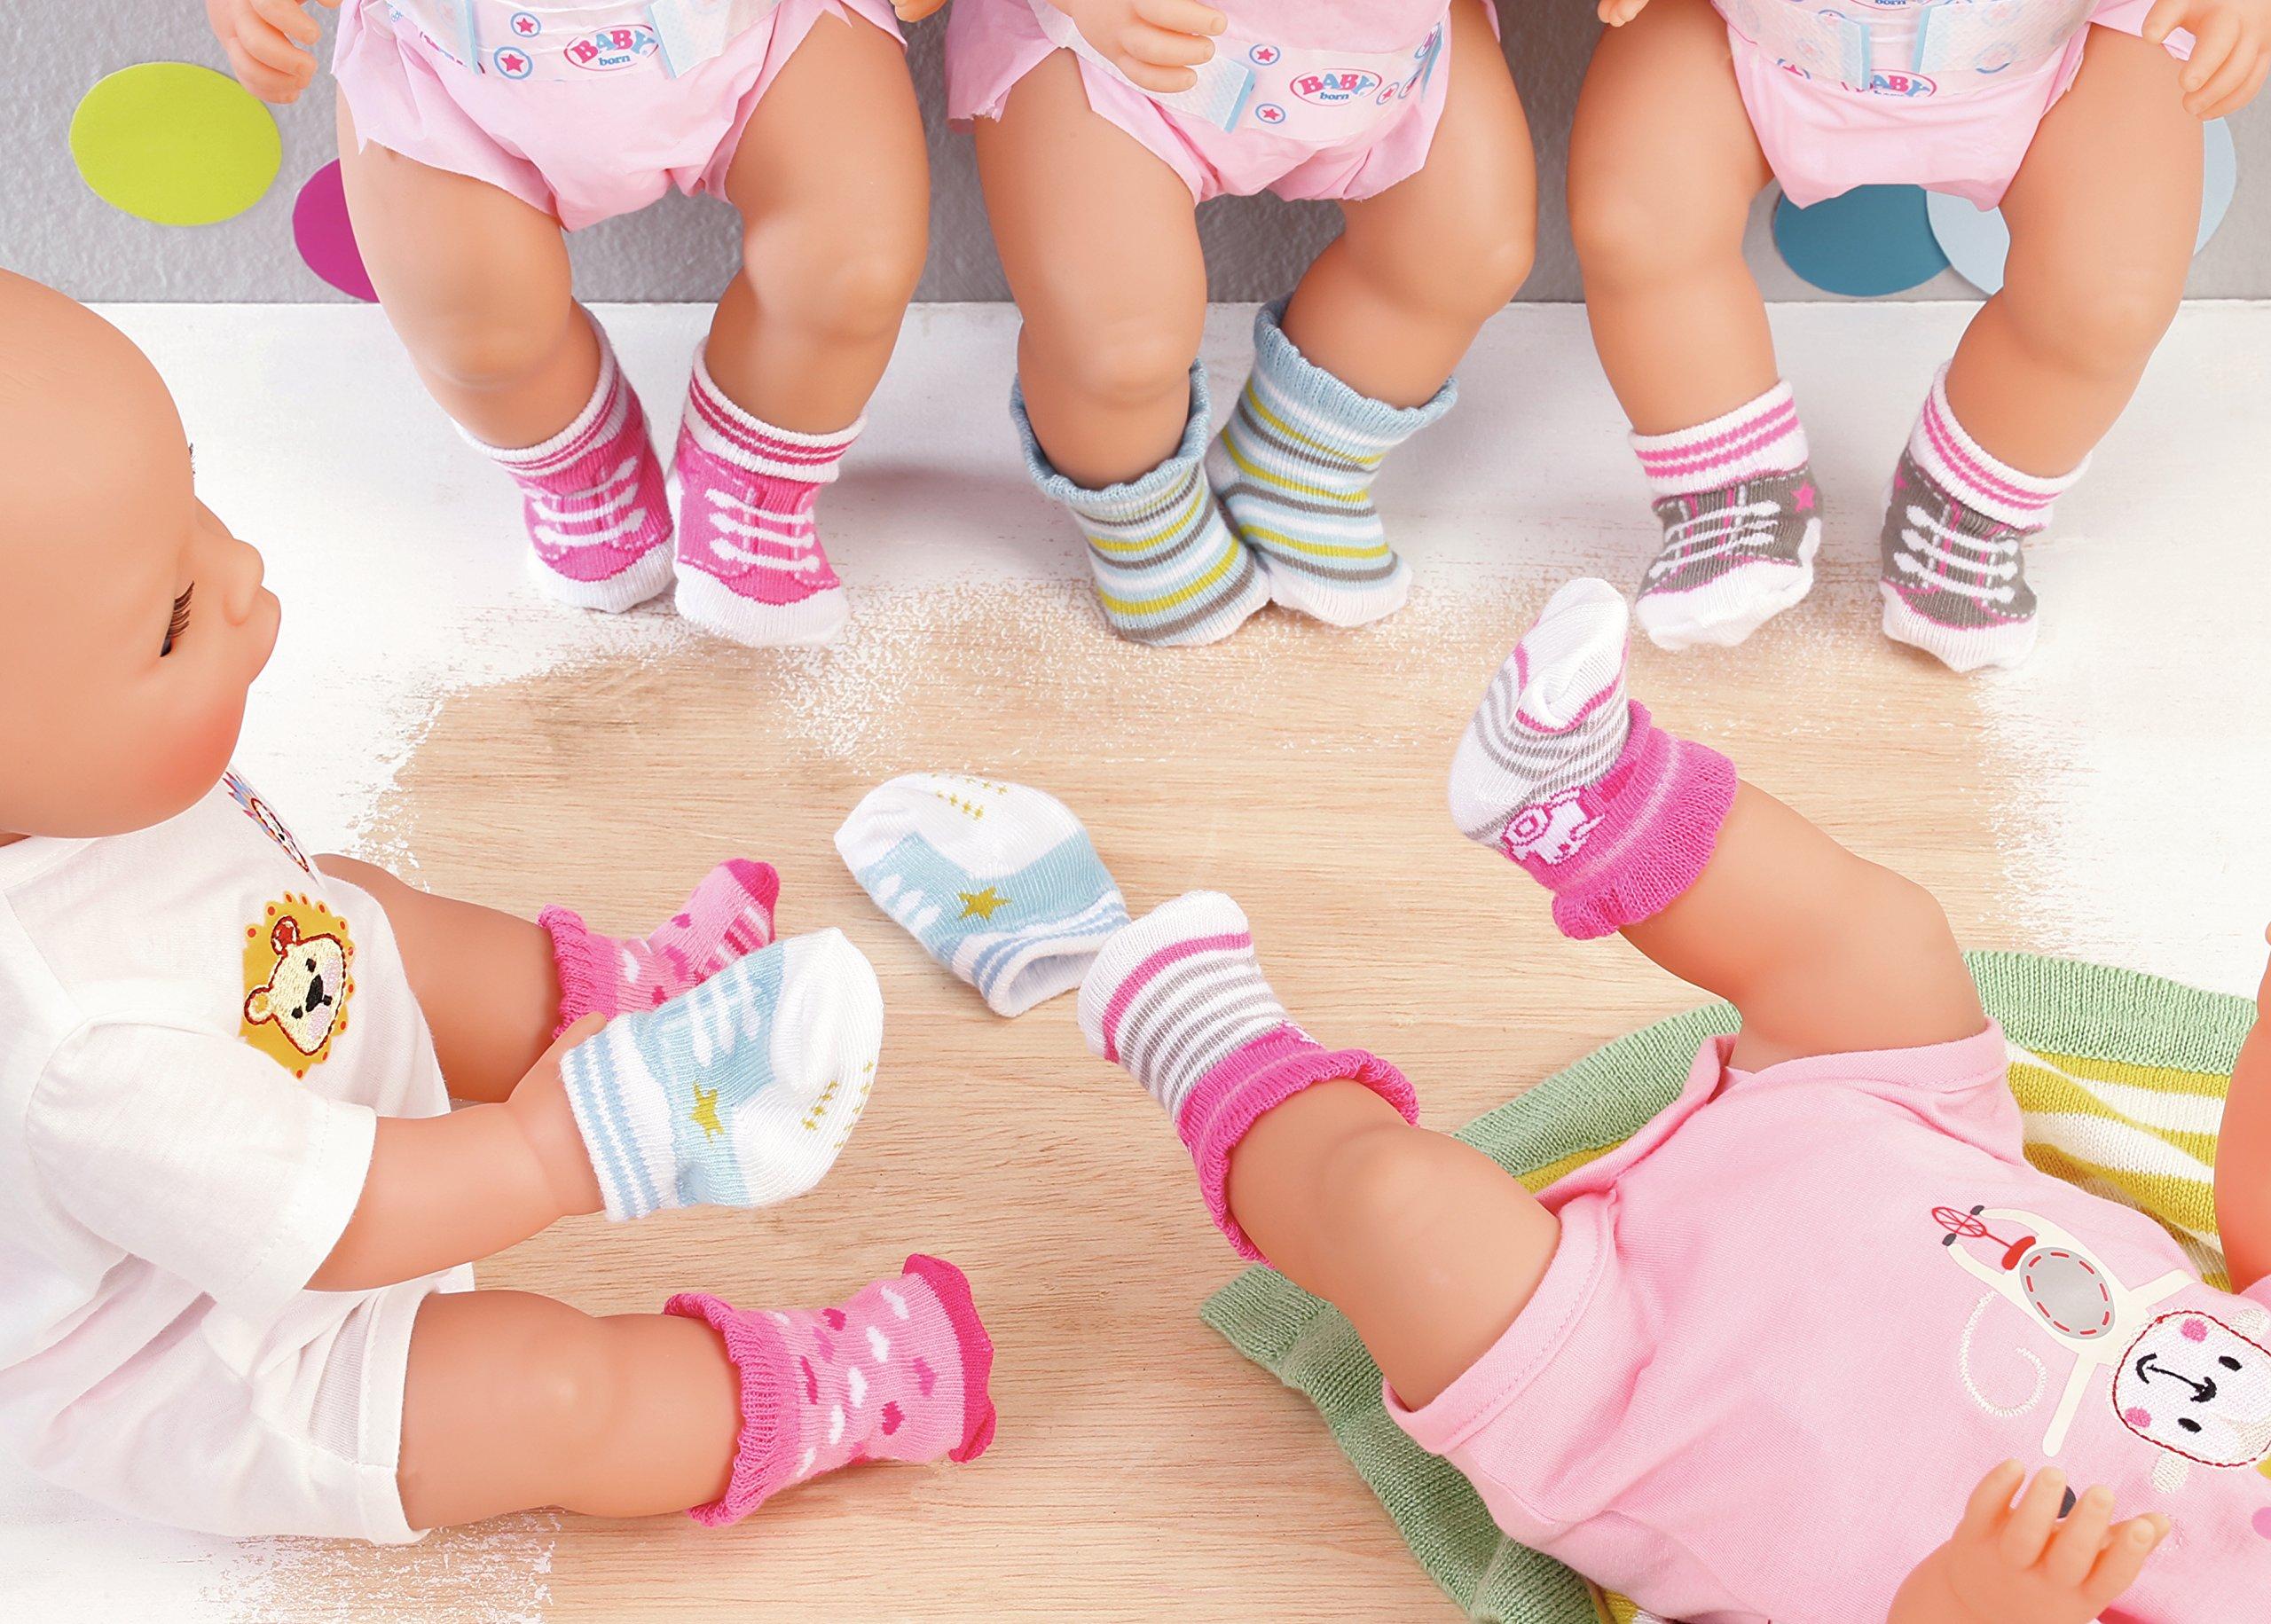 BABY born Socks, 2 pack Calcetines de muñeca - Accesorios para muñecas (2 pack, Calcetines de muñeca, 3 año(s… 5